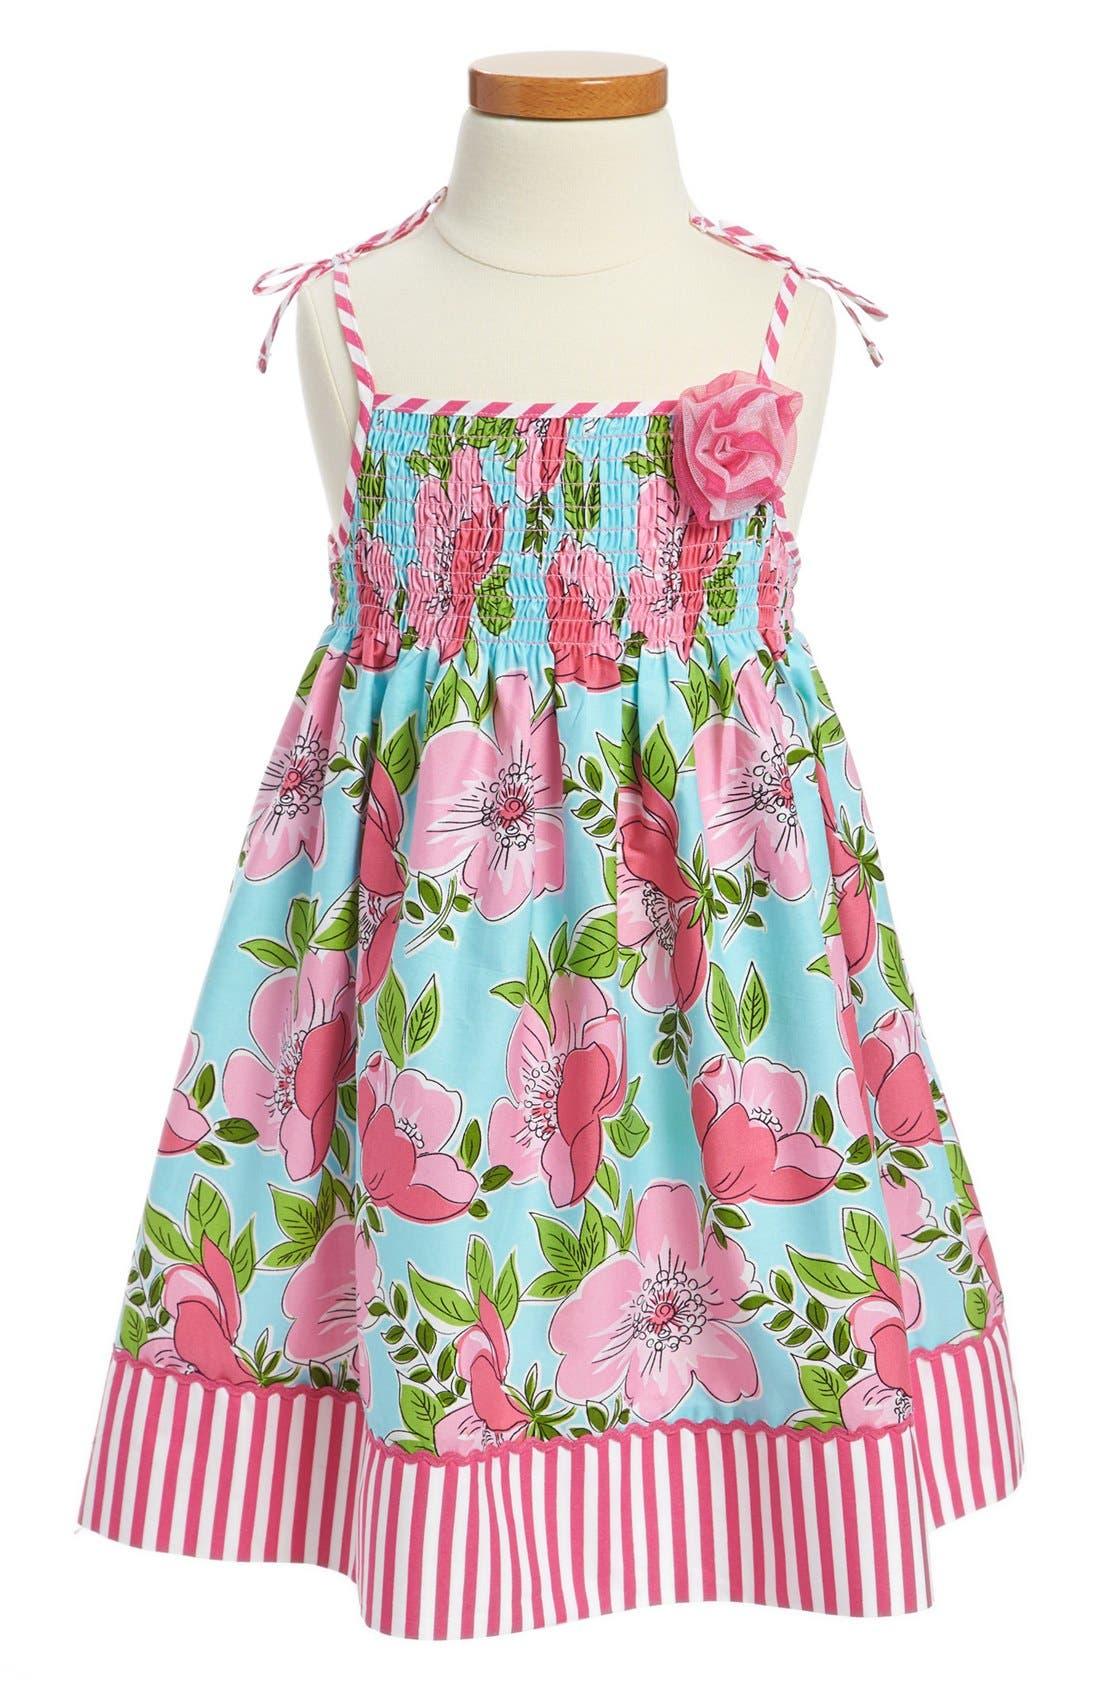 Main Image - Marmelatta Floral Dress (Toddler Girls)